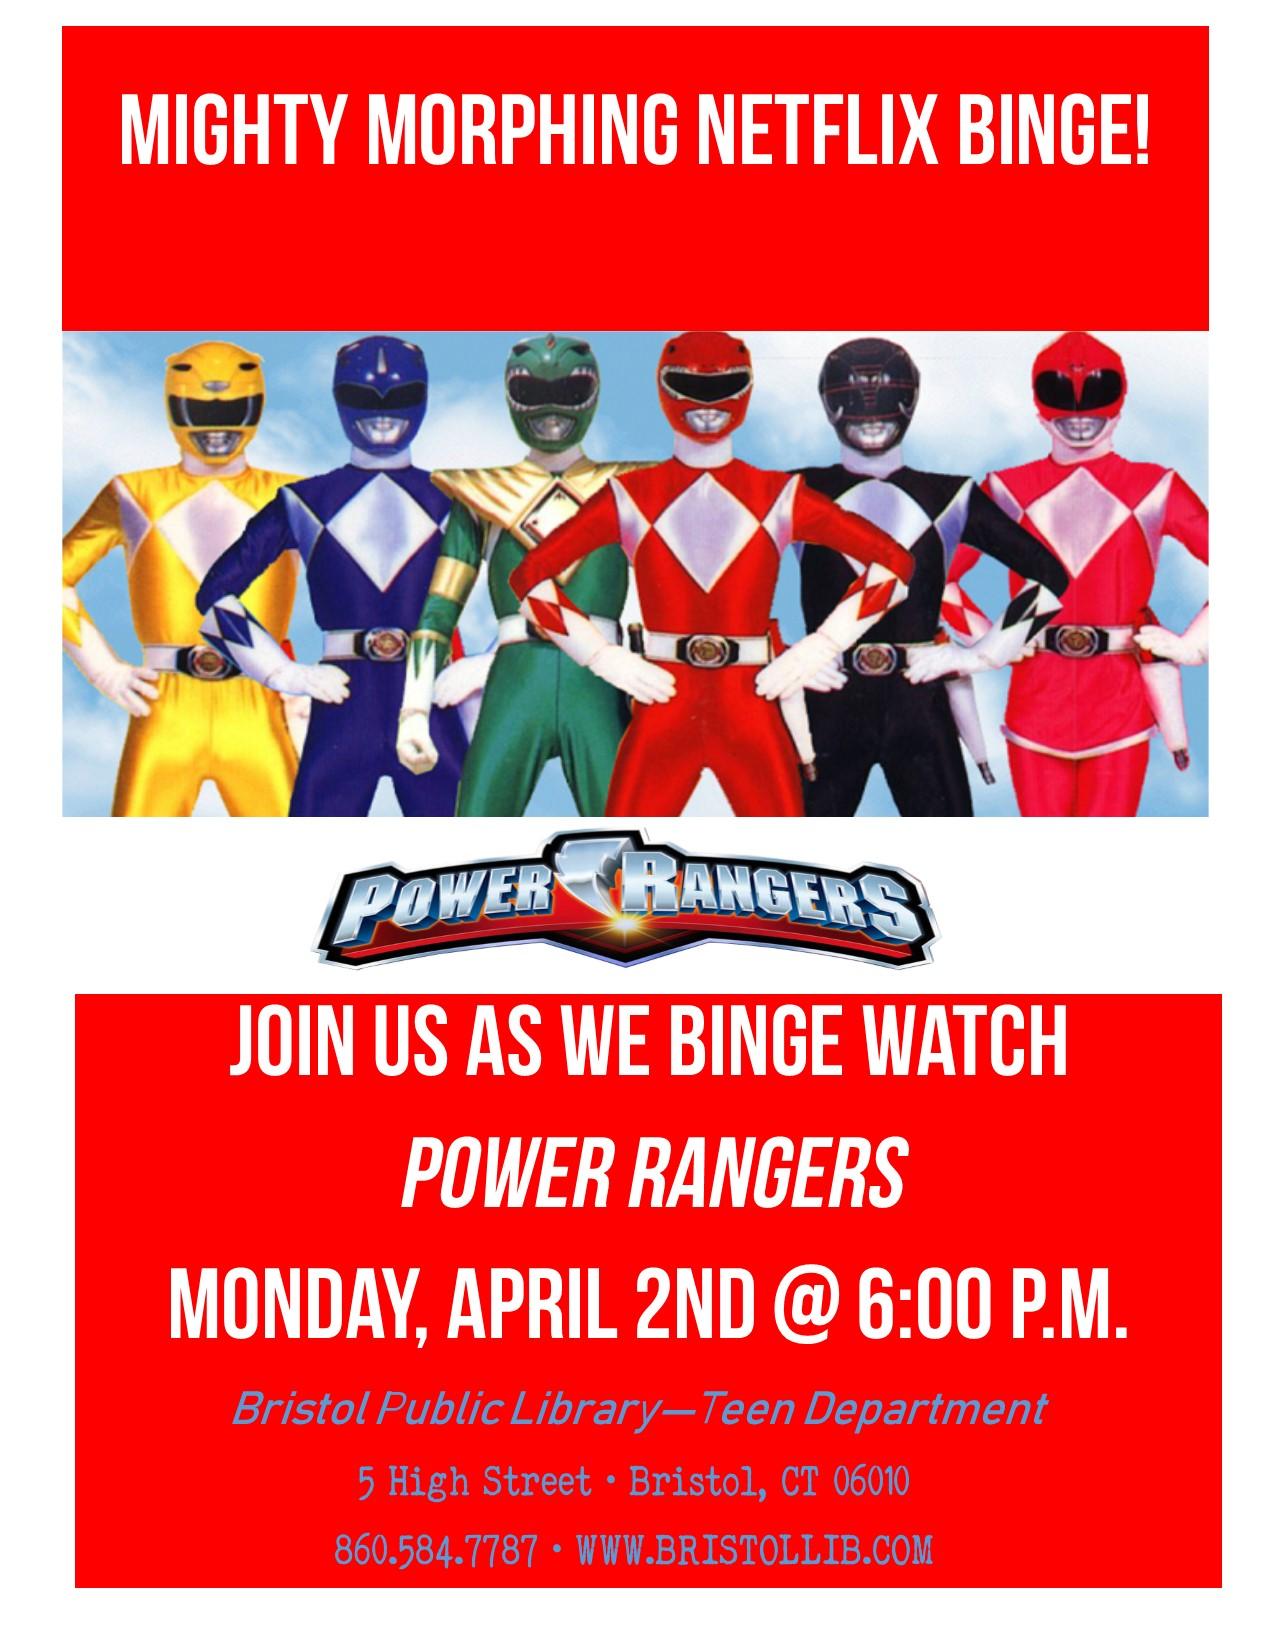 Netflix Binge: Power Rangers - Bristol Public Library